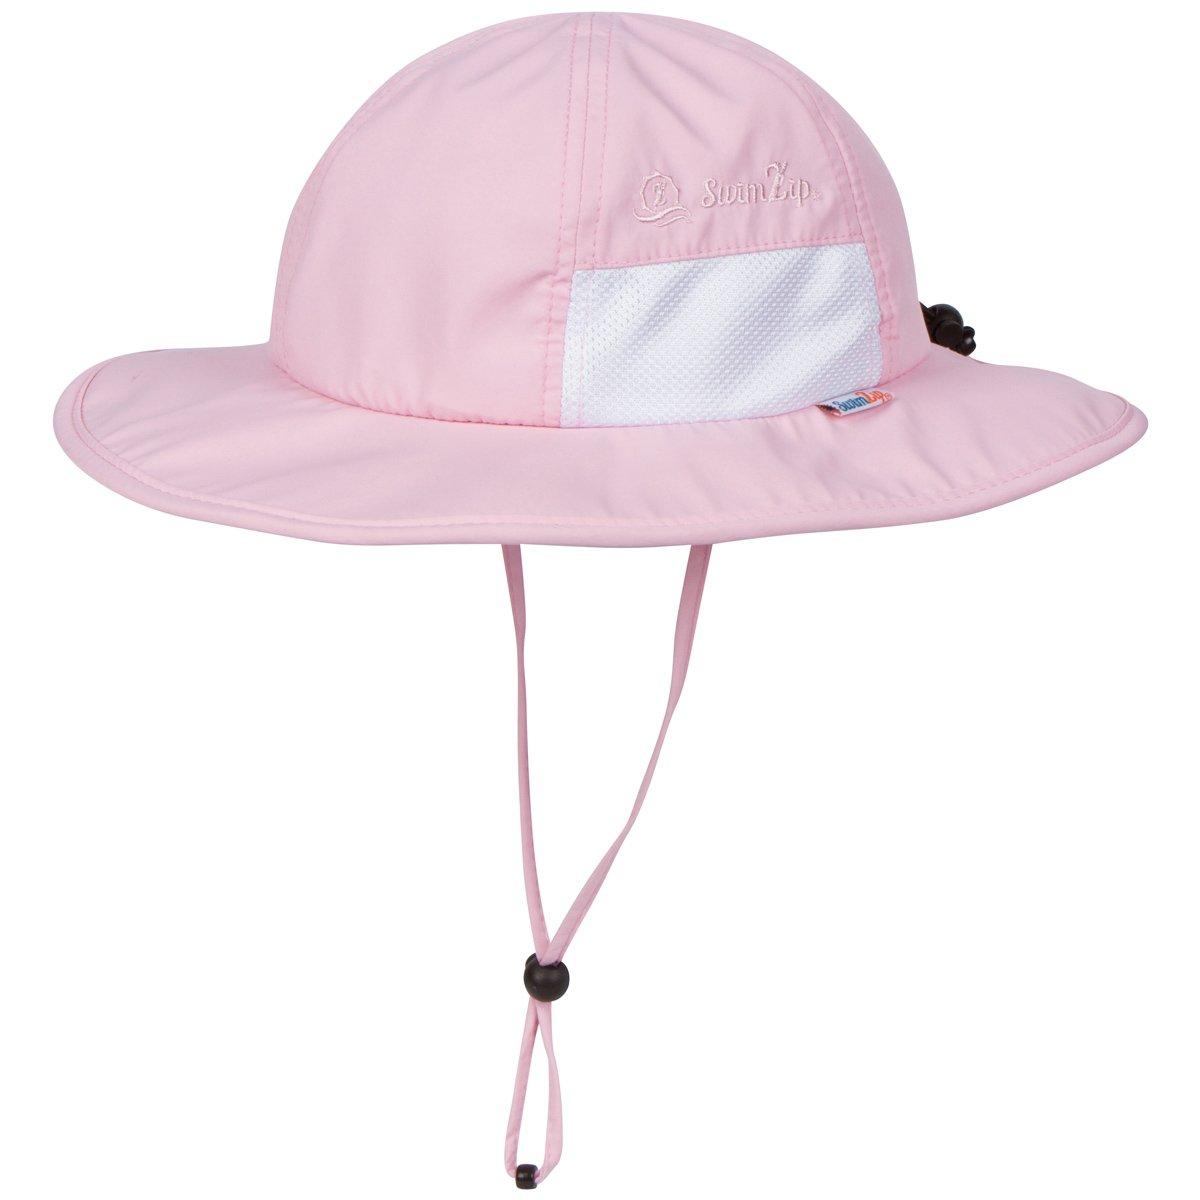 SwimZip Unisex Child Wide Brim Sun Protection Hat